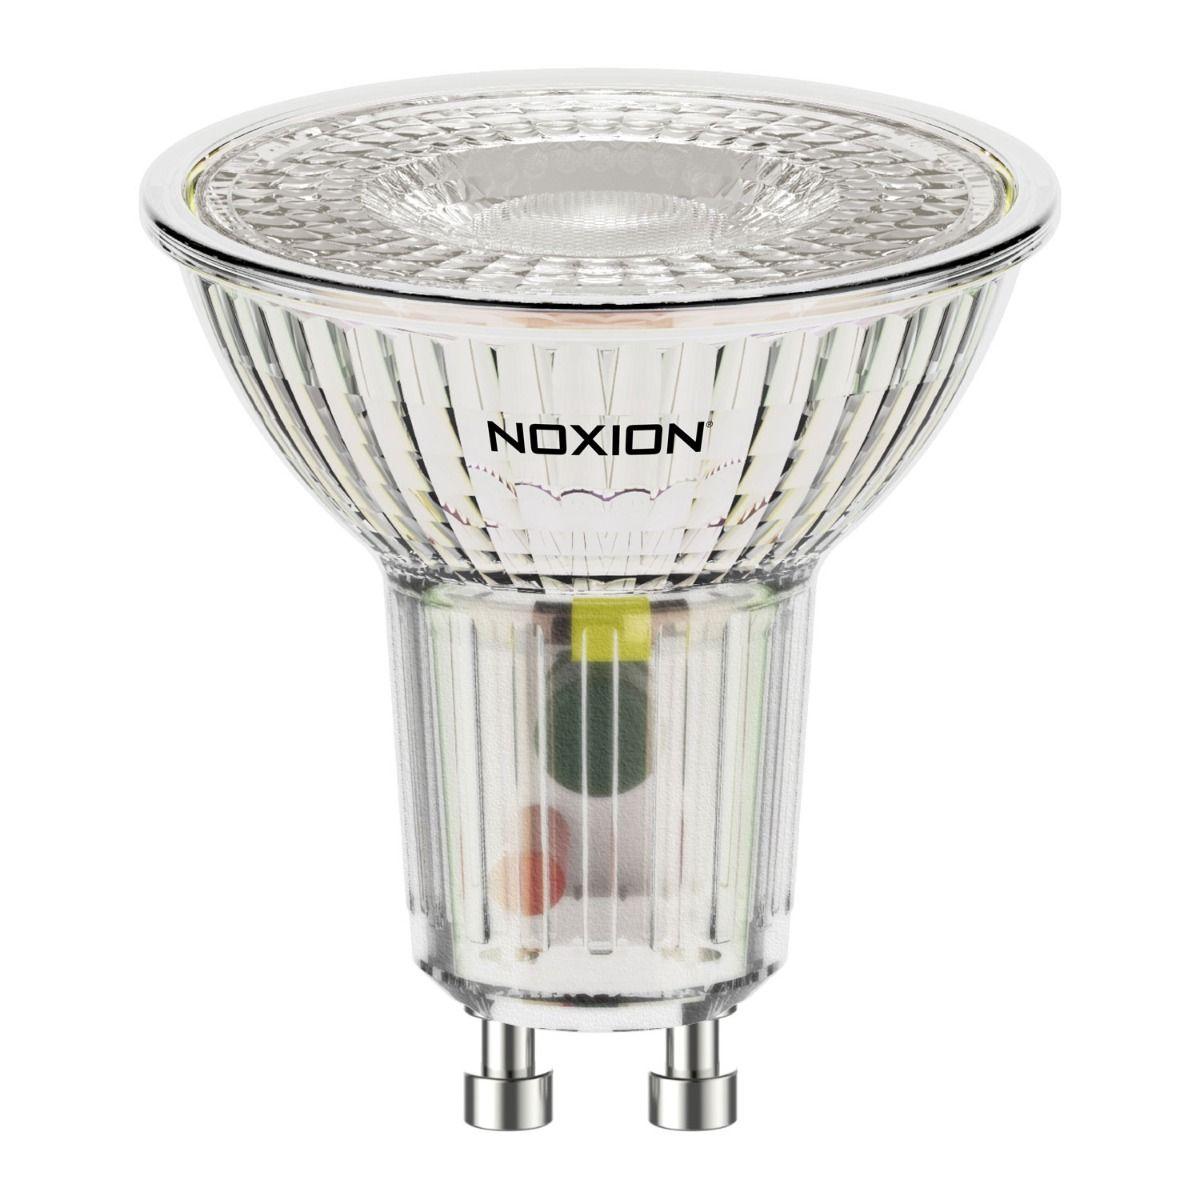 Noxion LED Spot GU10 3.7W 827 36D 260lm | Replacer for 35W